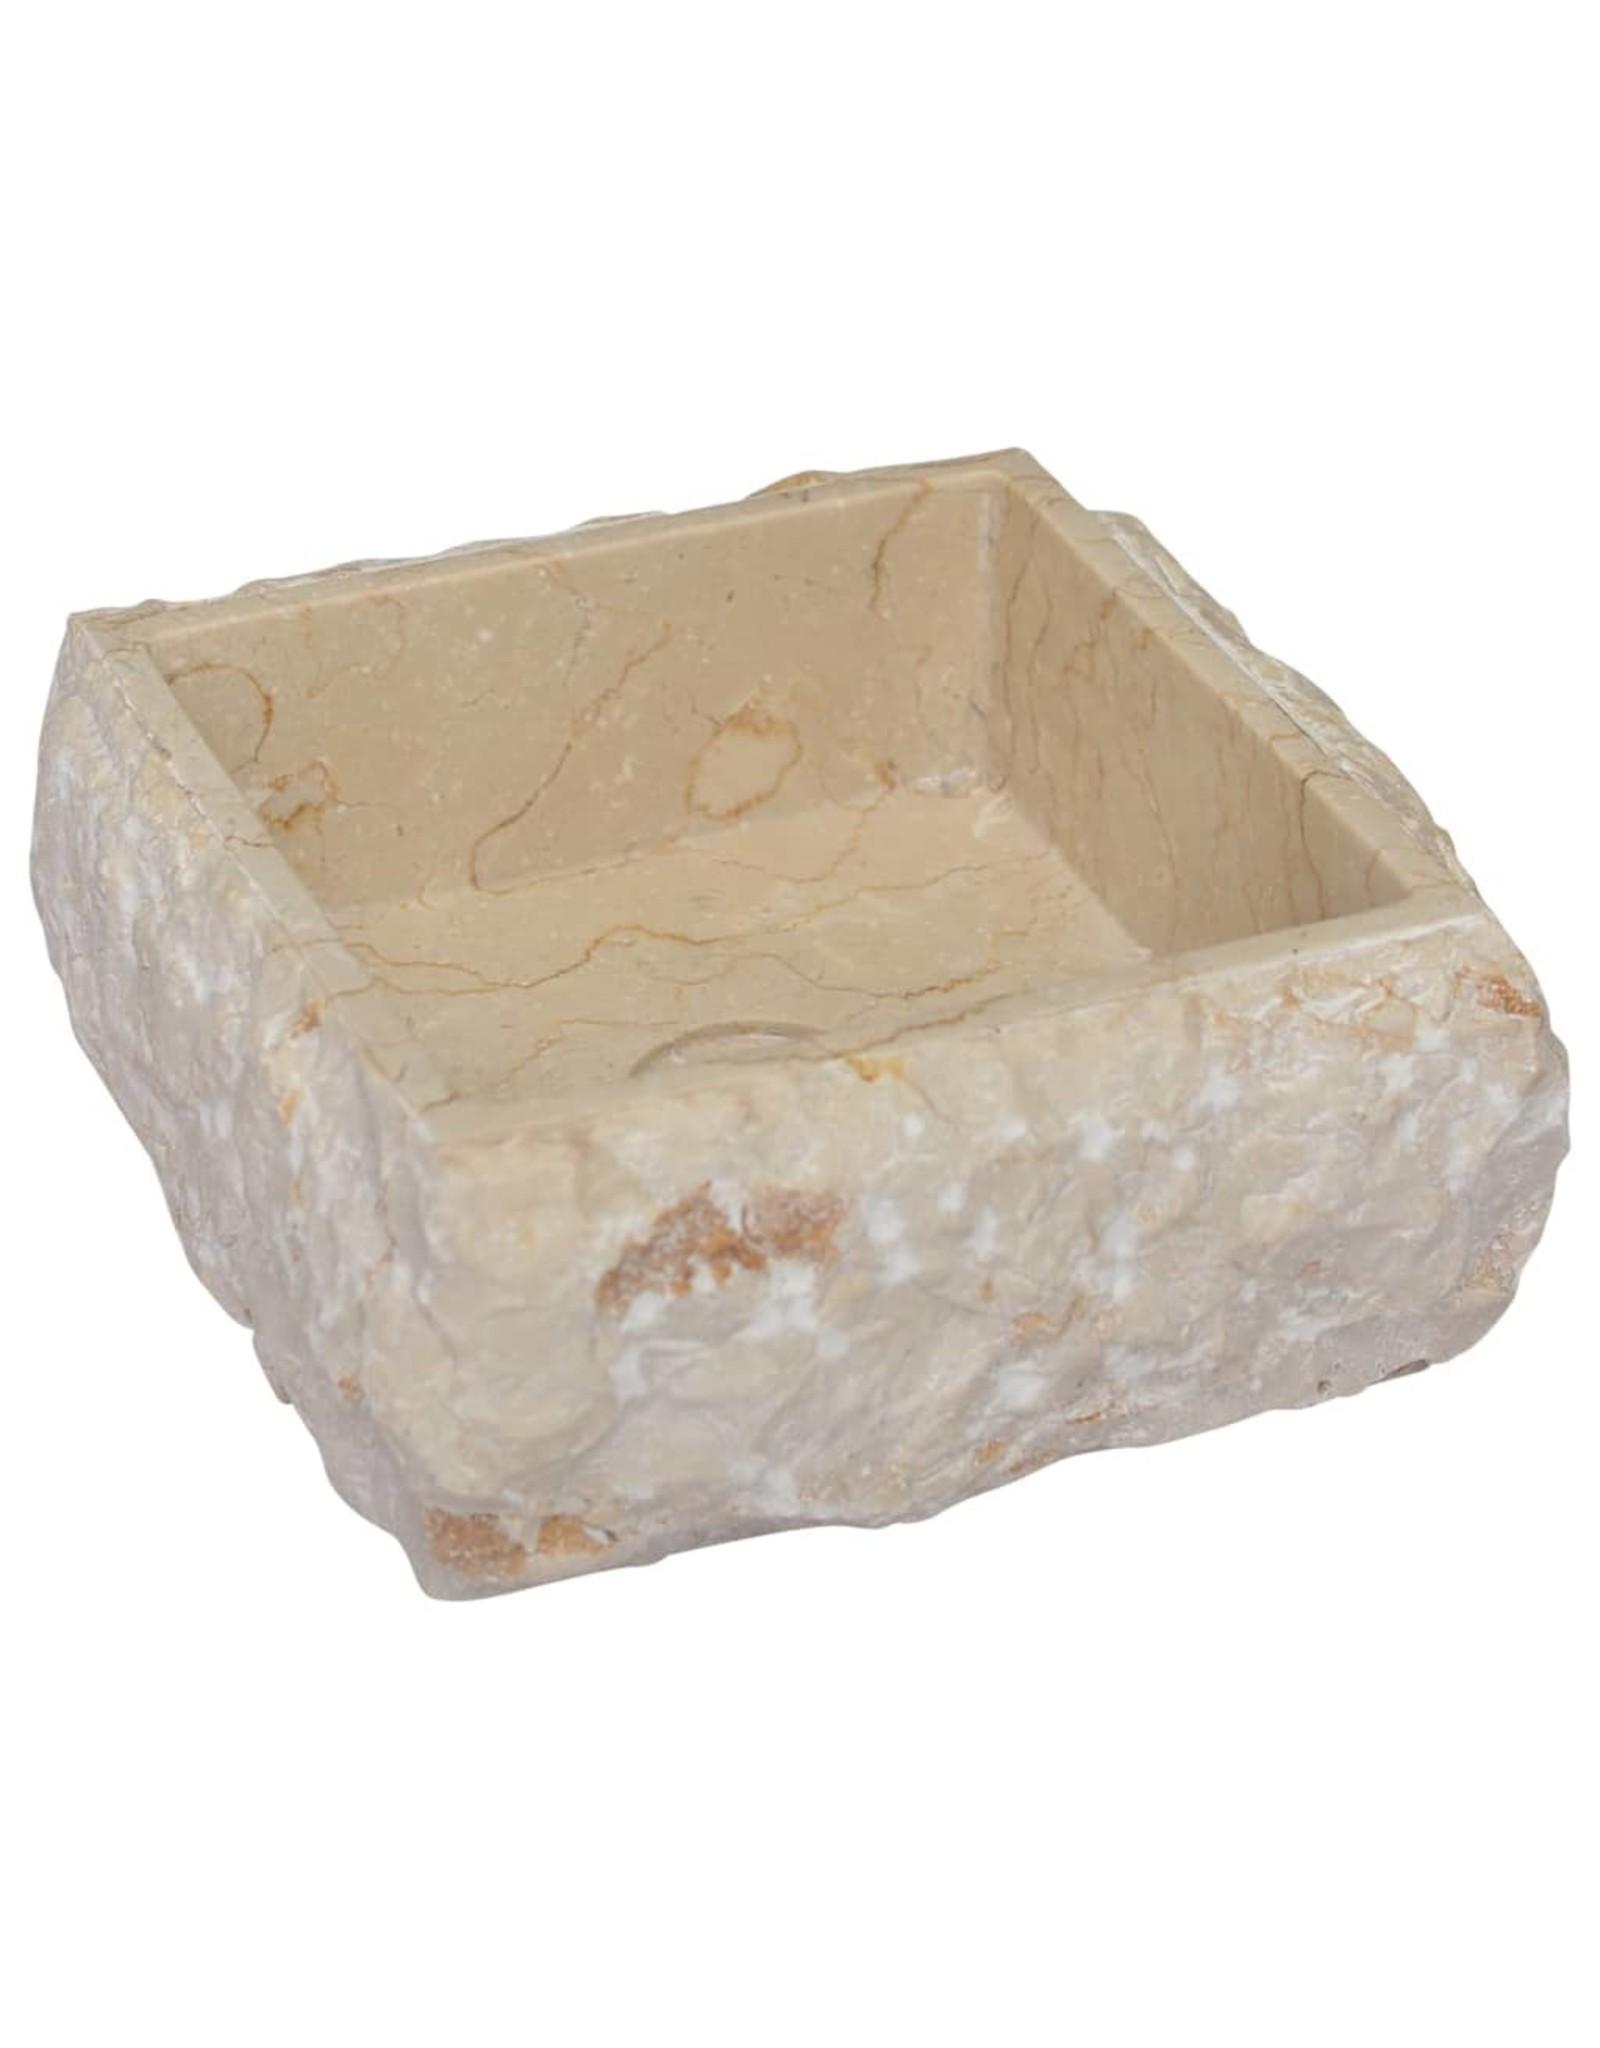 Gootsteen 30x30x13 cm marmer crèmekleurig